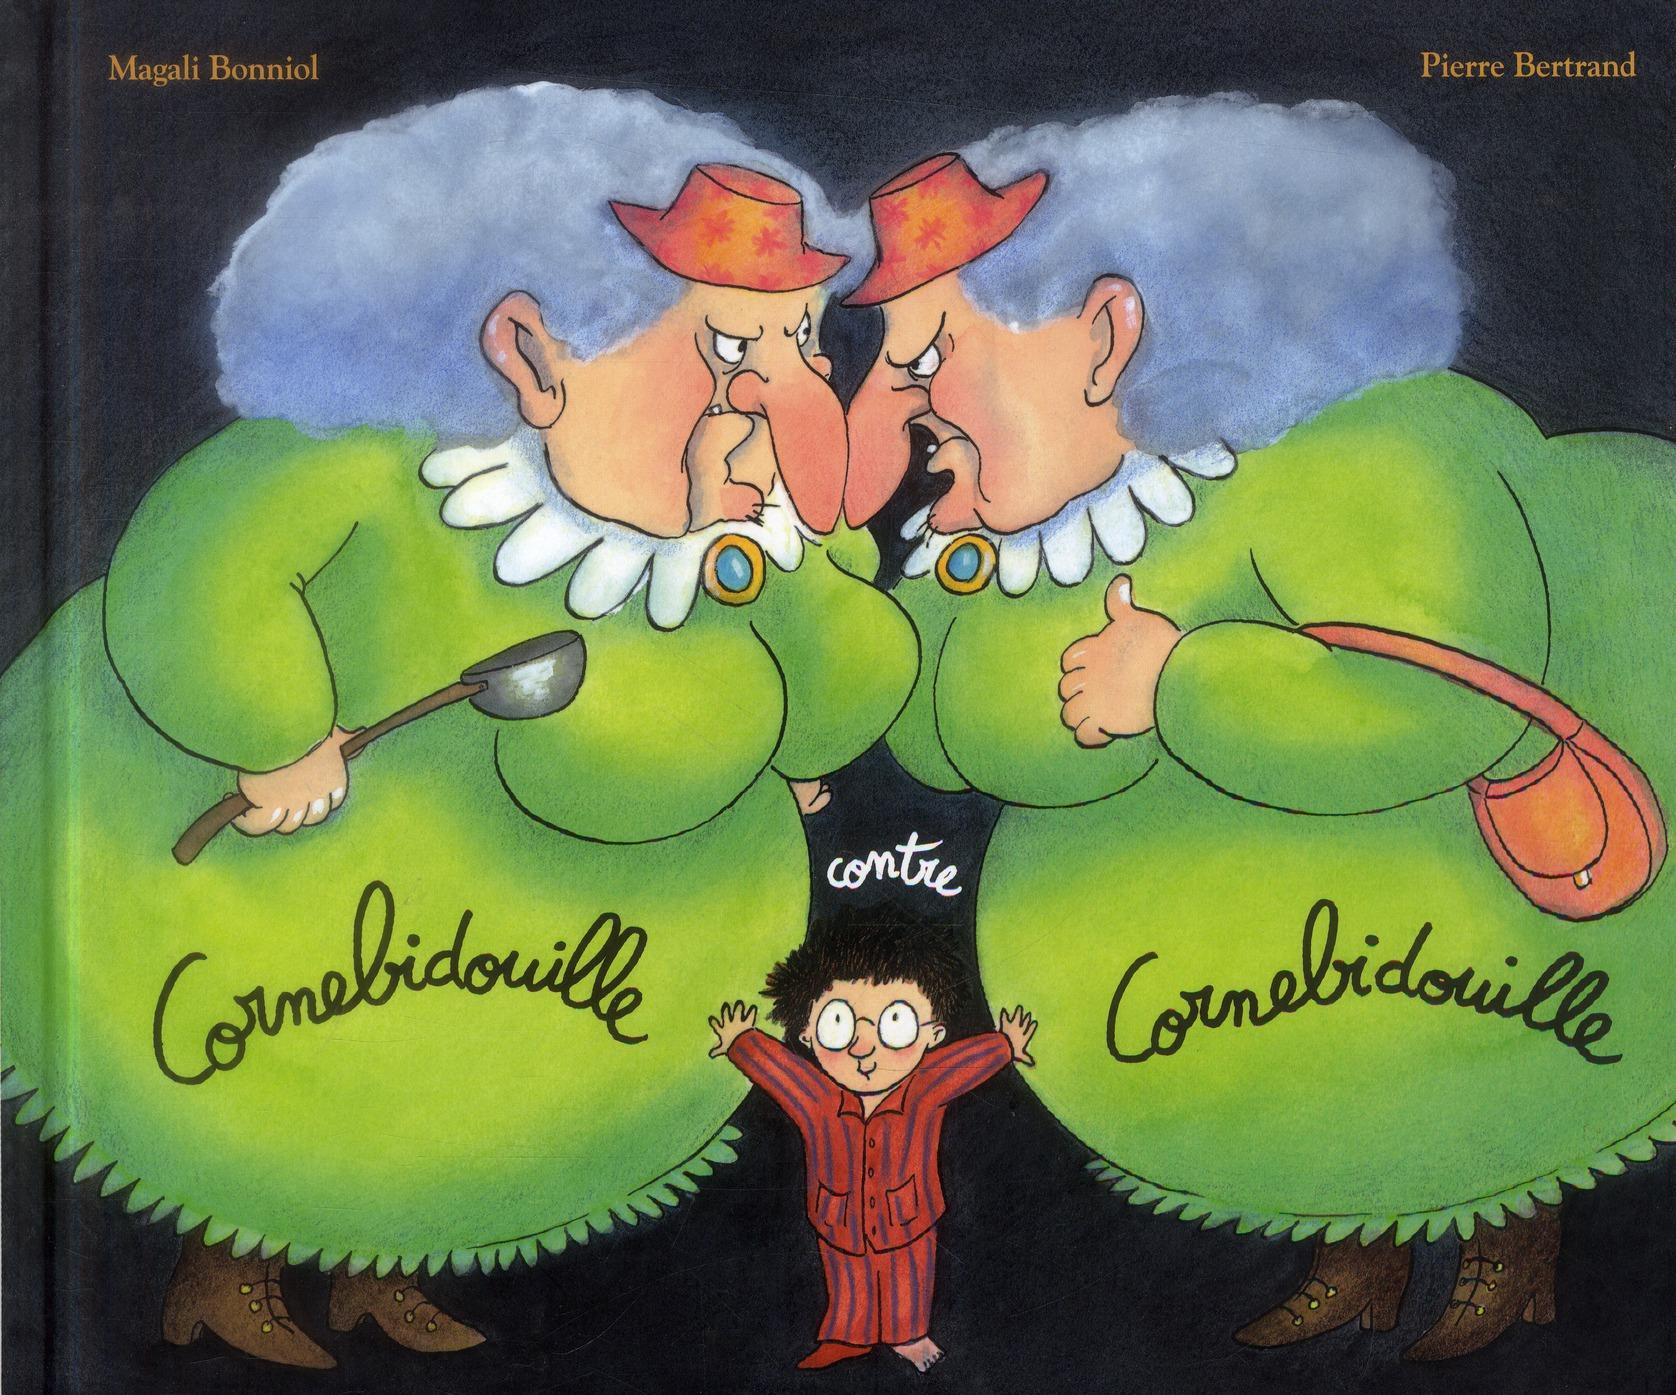 CORNEBIDOUILLE CONTRE CORNEBIDOUILLE BERTRAND/BONNIOL Ecole des loisirs